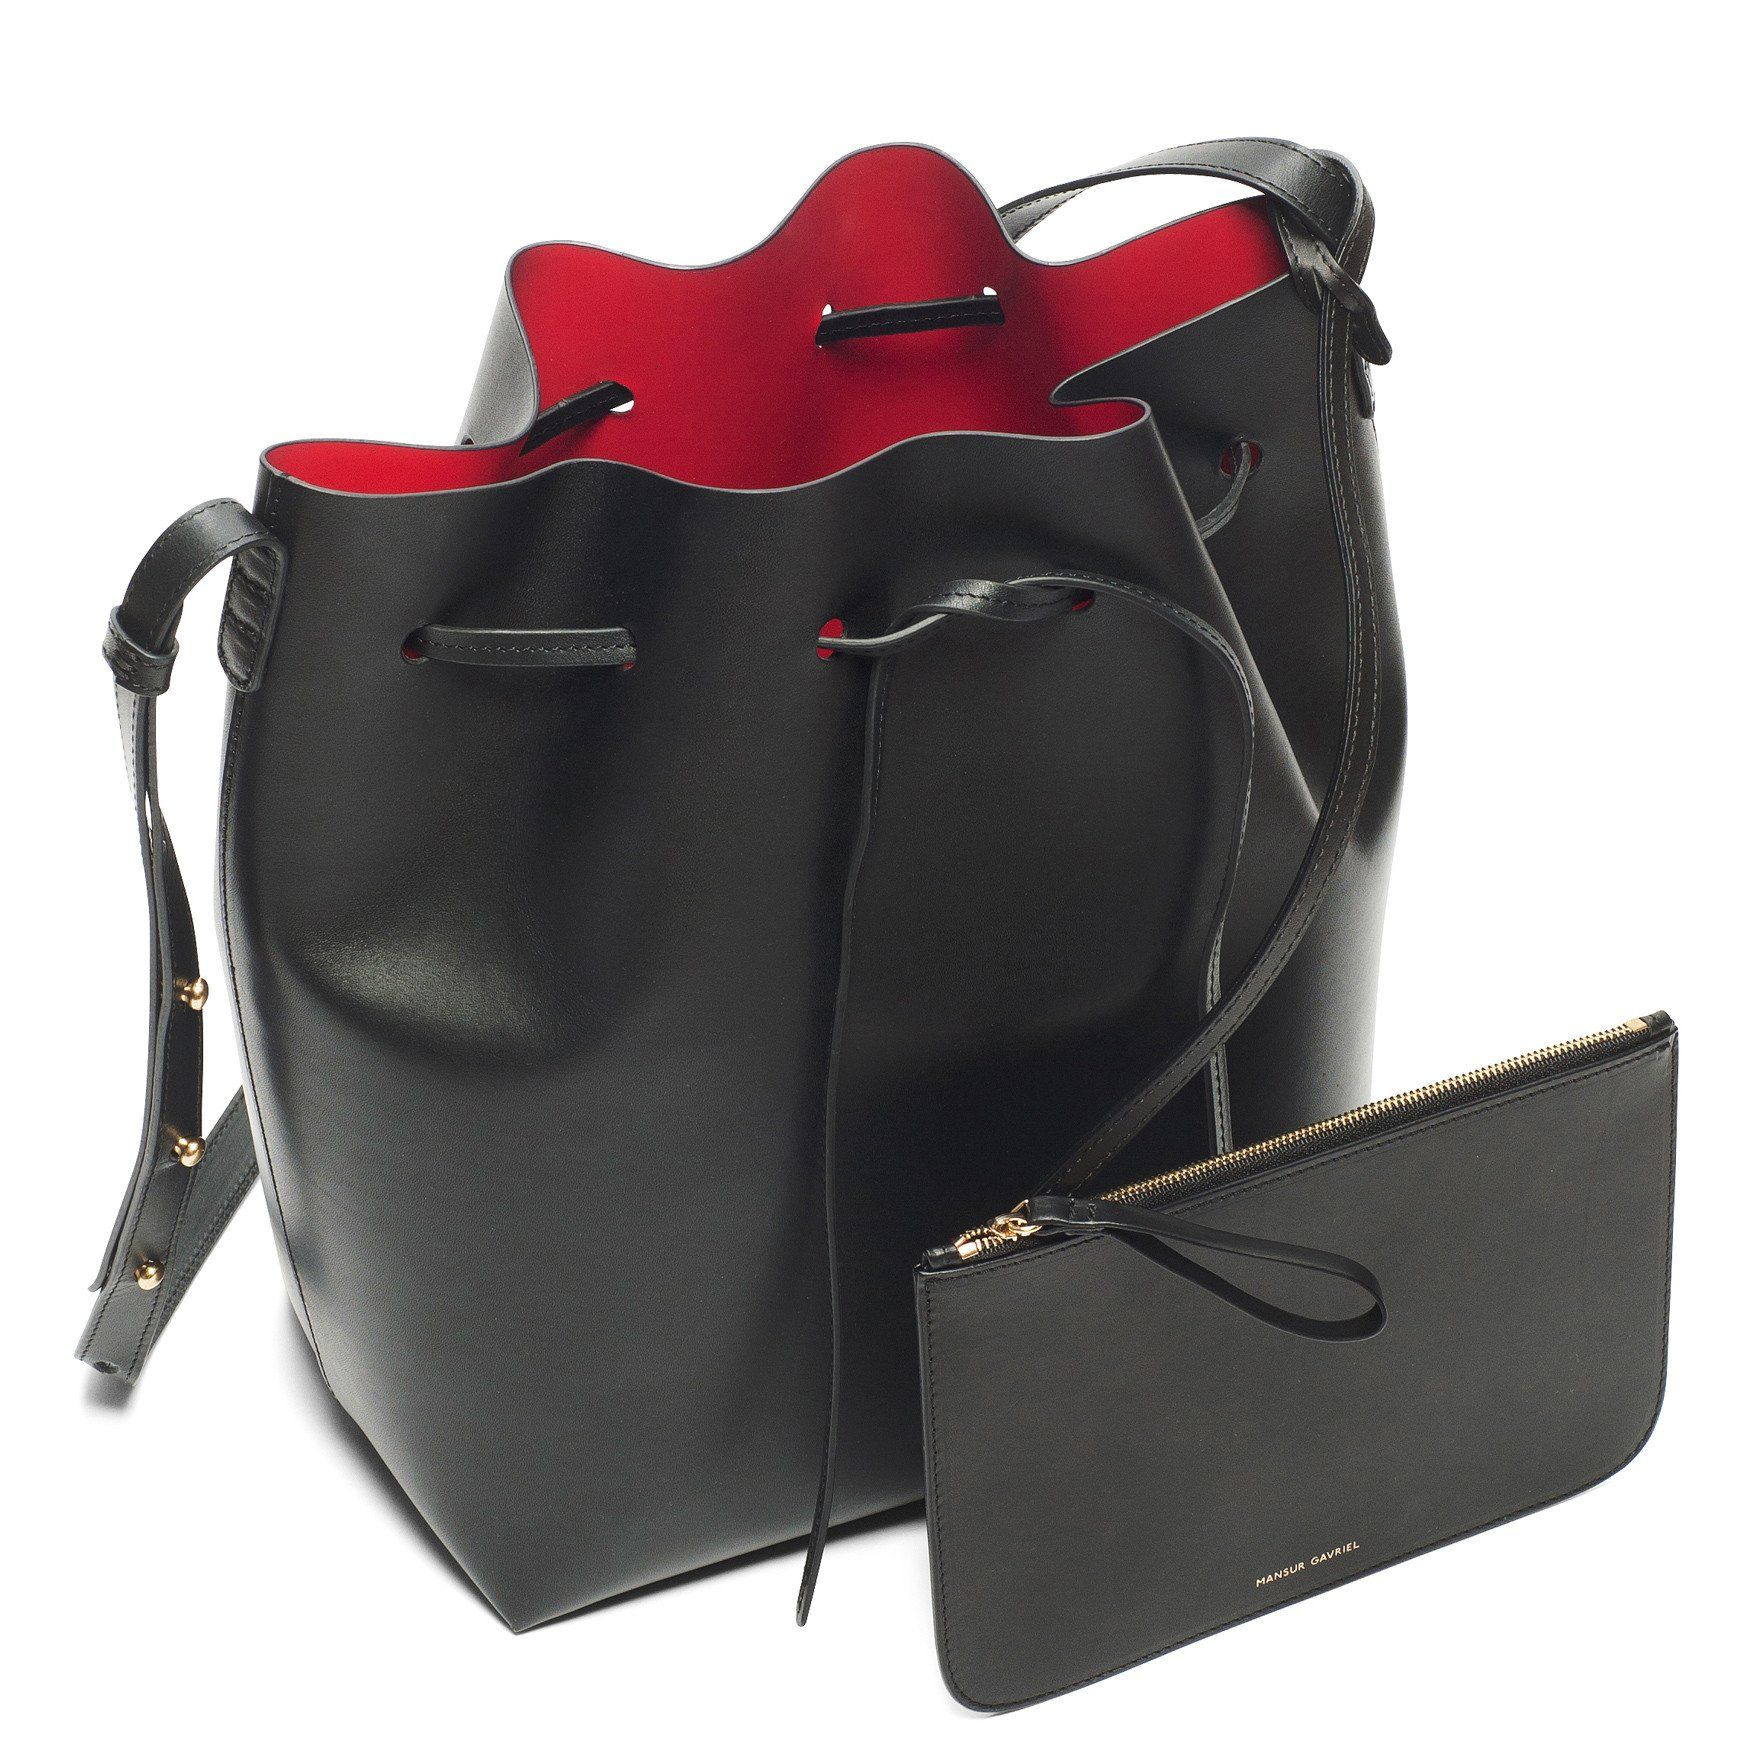 Mansur Gavriel Bucket Bag Black Flamma